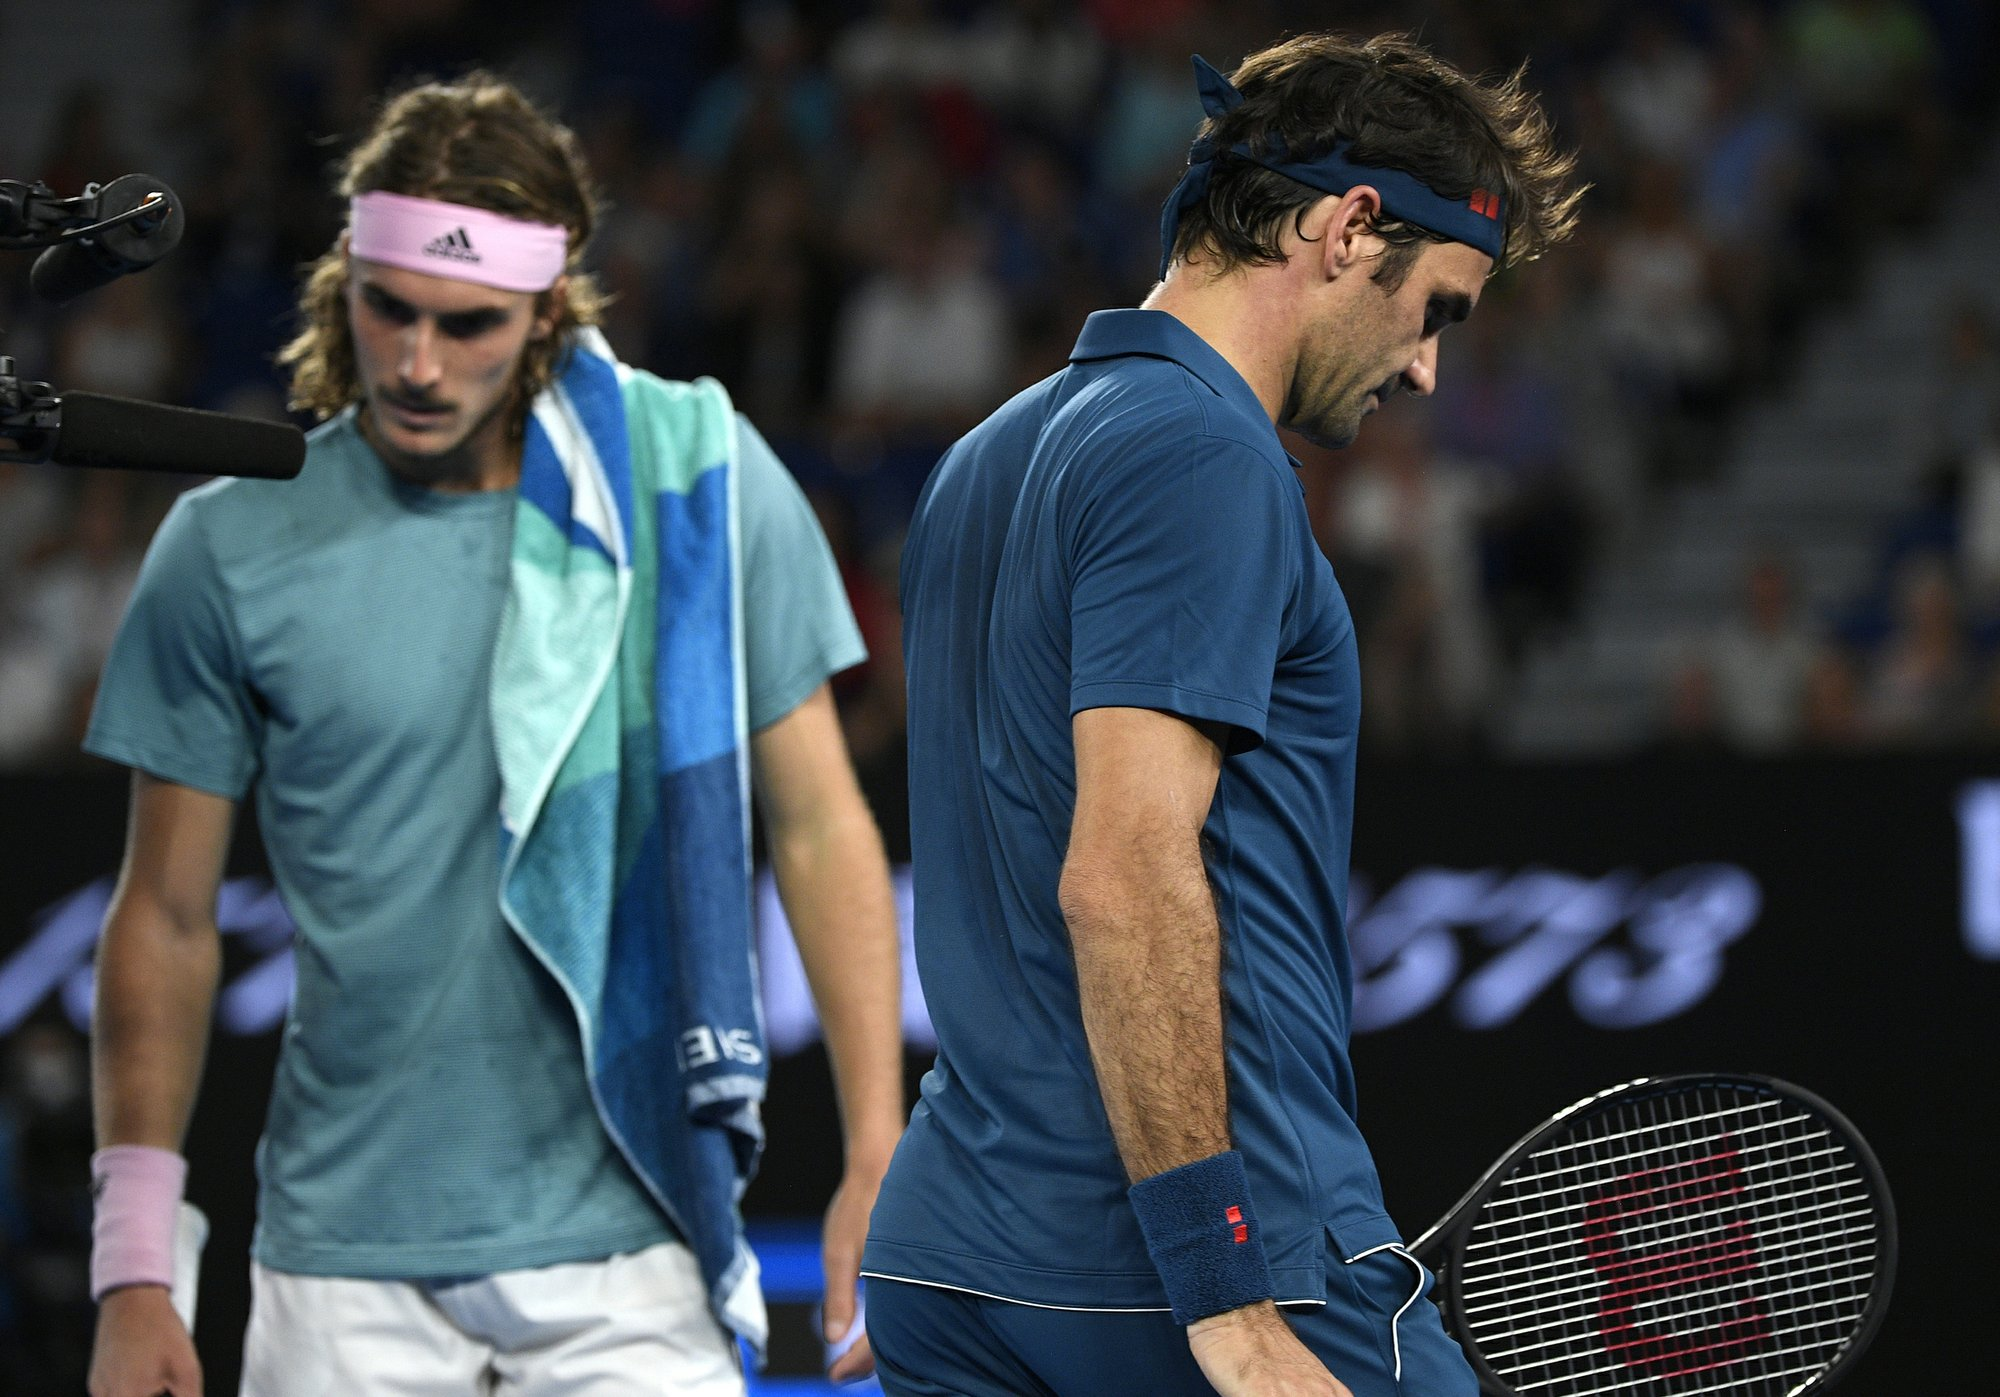 Tsitsipas Da La Sorpresa Al Derrotar A Federer En Australia